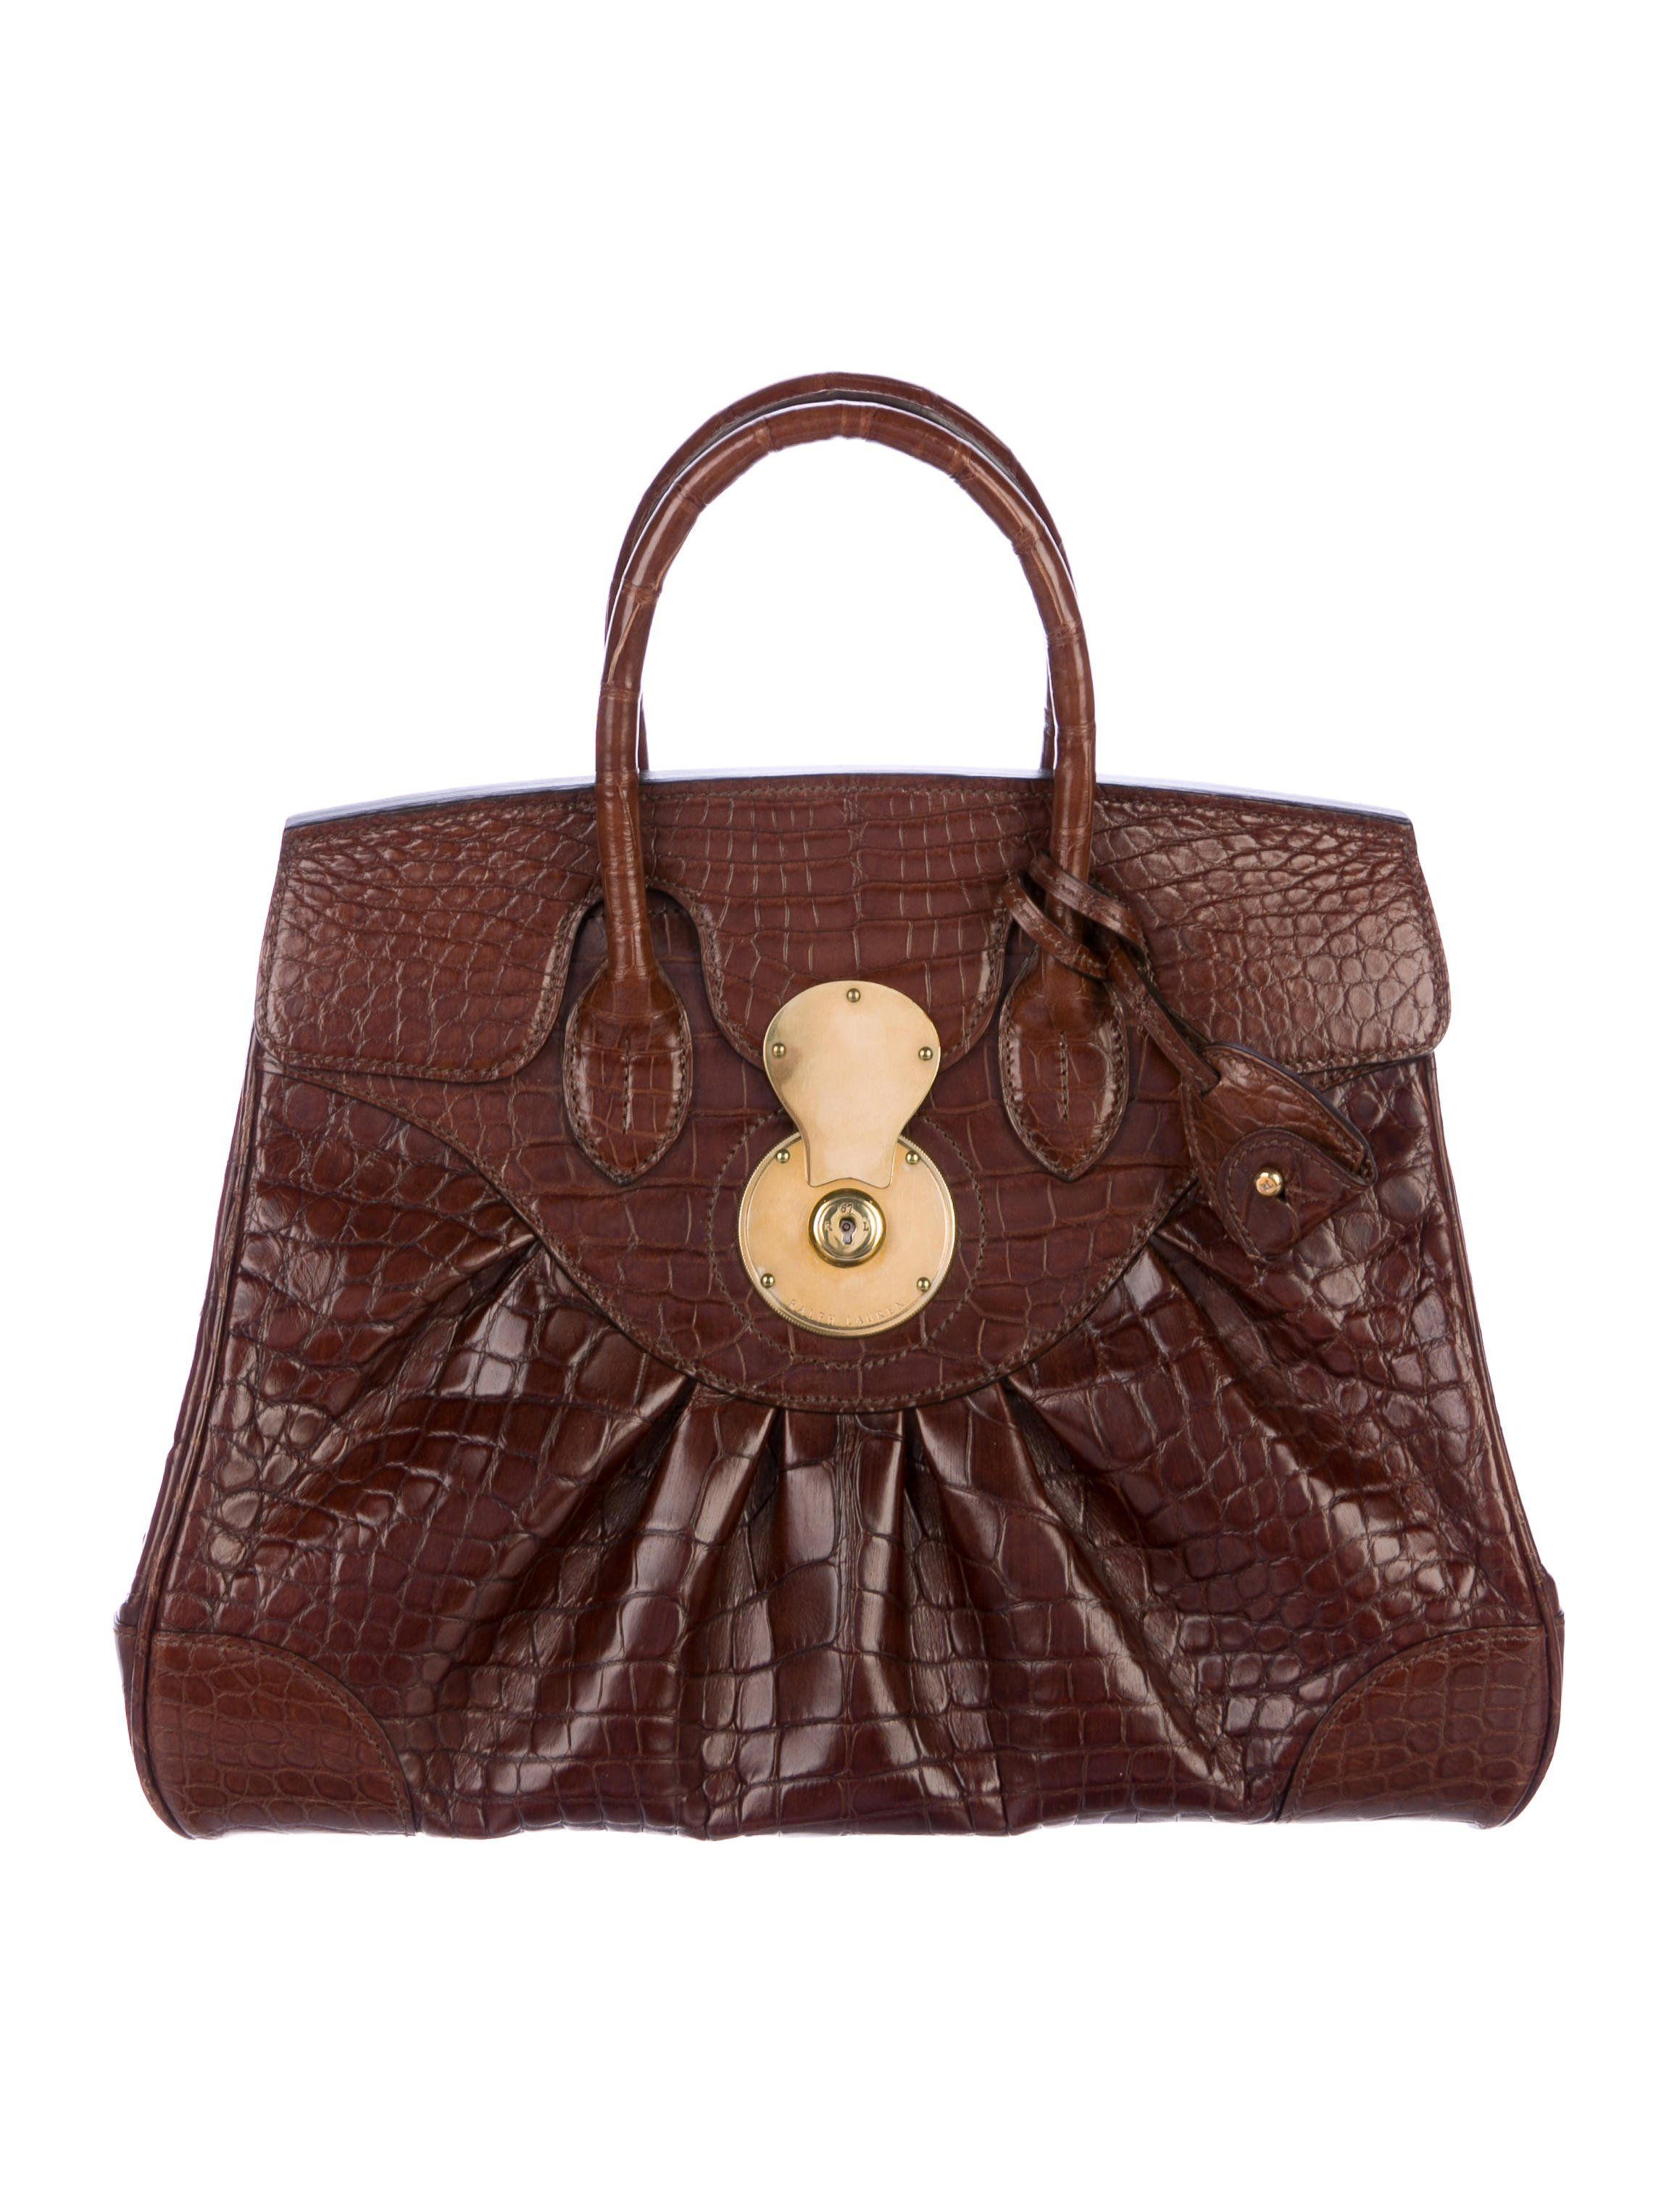 ee3d9b035ecb ... sweden luxury online shopping ralph lauren alligator ricky bag 2f3b1  b776d